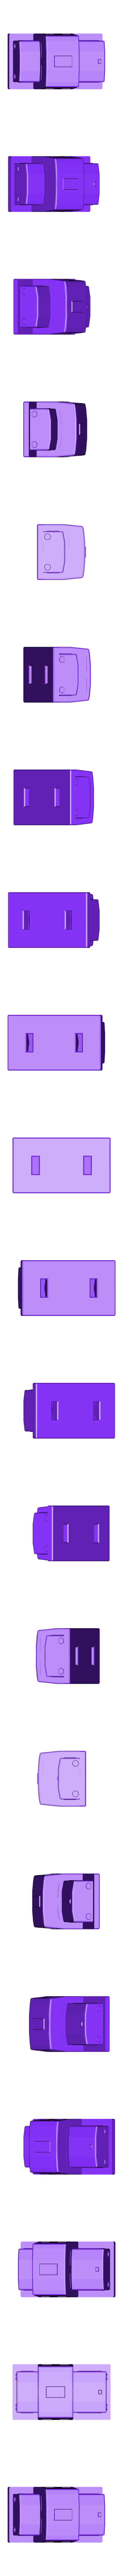 SmallToys-TrainBodyLoco1.stl Download STL file SmallToys - Starter Pack • 3D printer model, Wabby